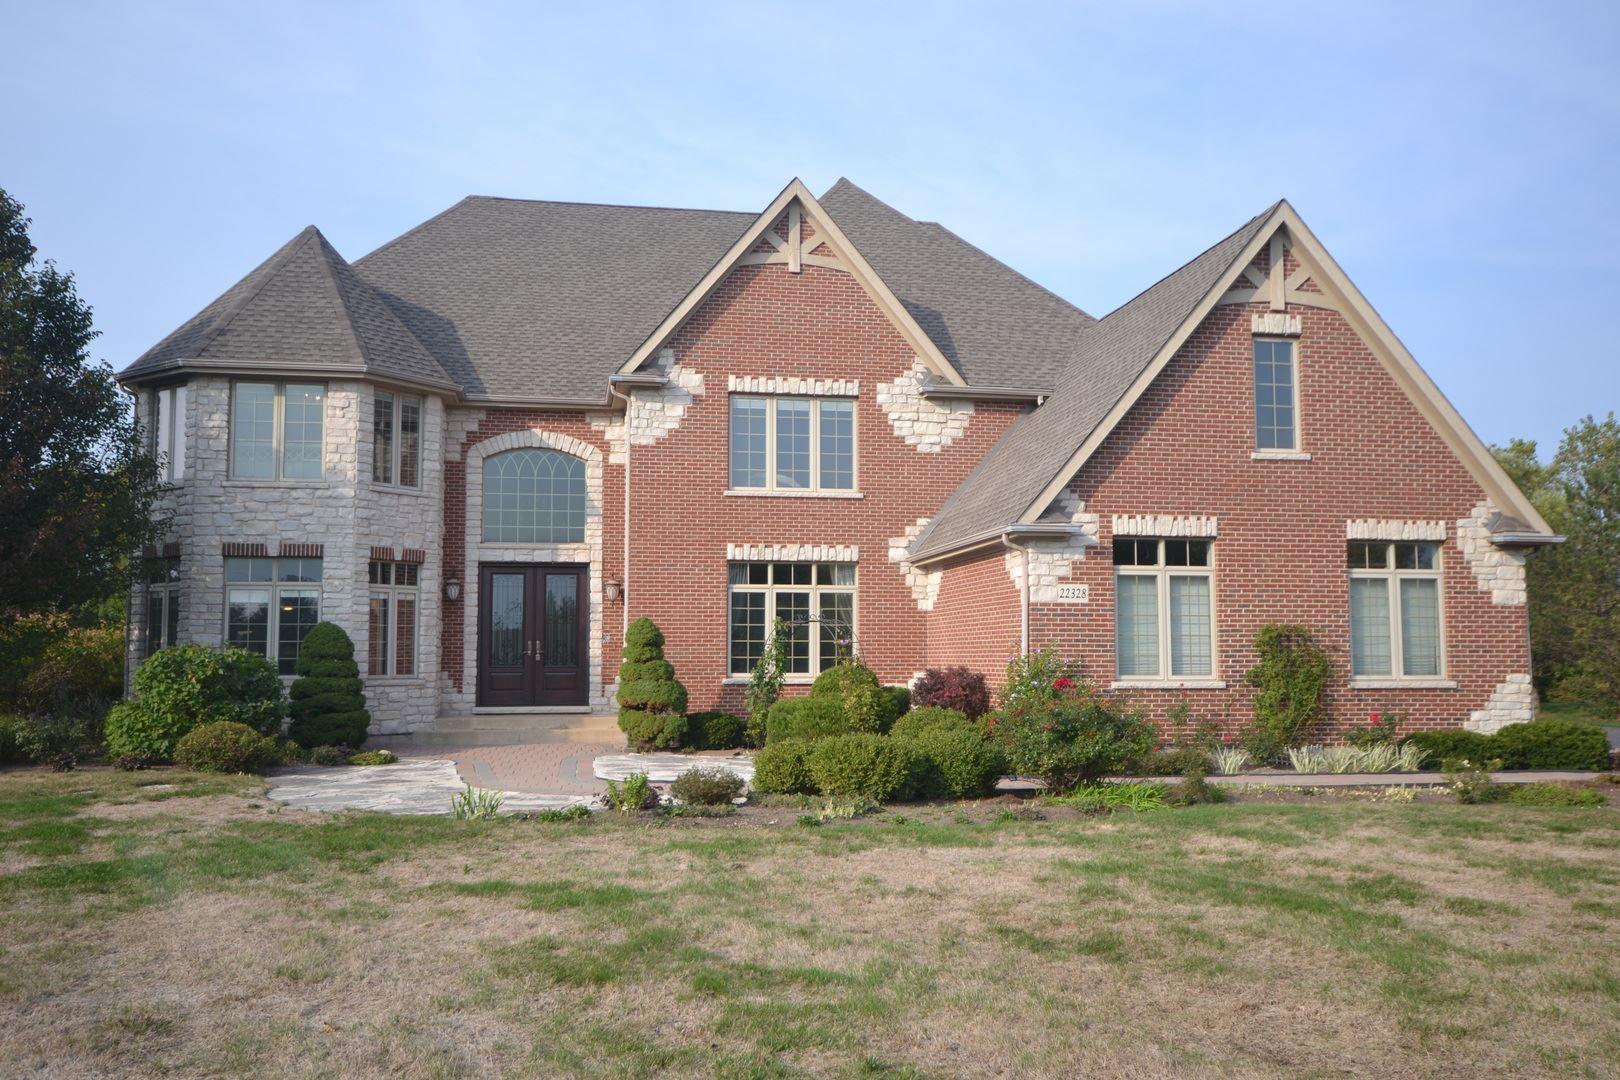 22328 N Prairie Court, Kildeer, IL 60047 - #: 11126521